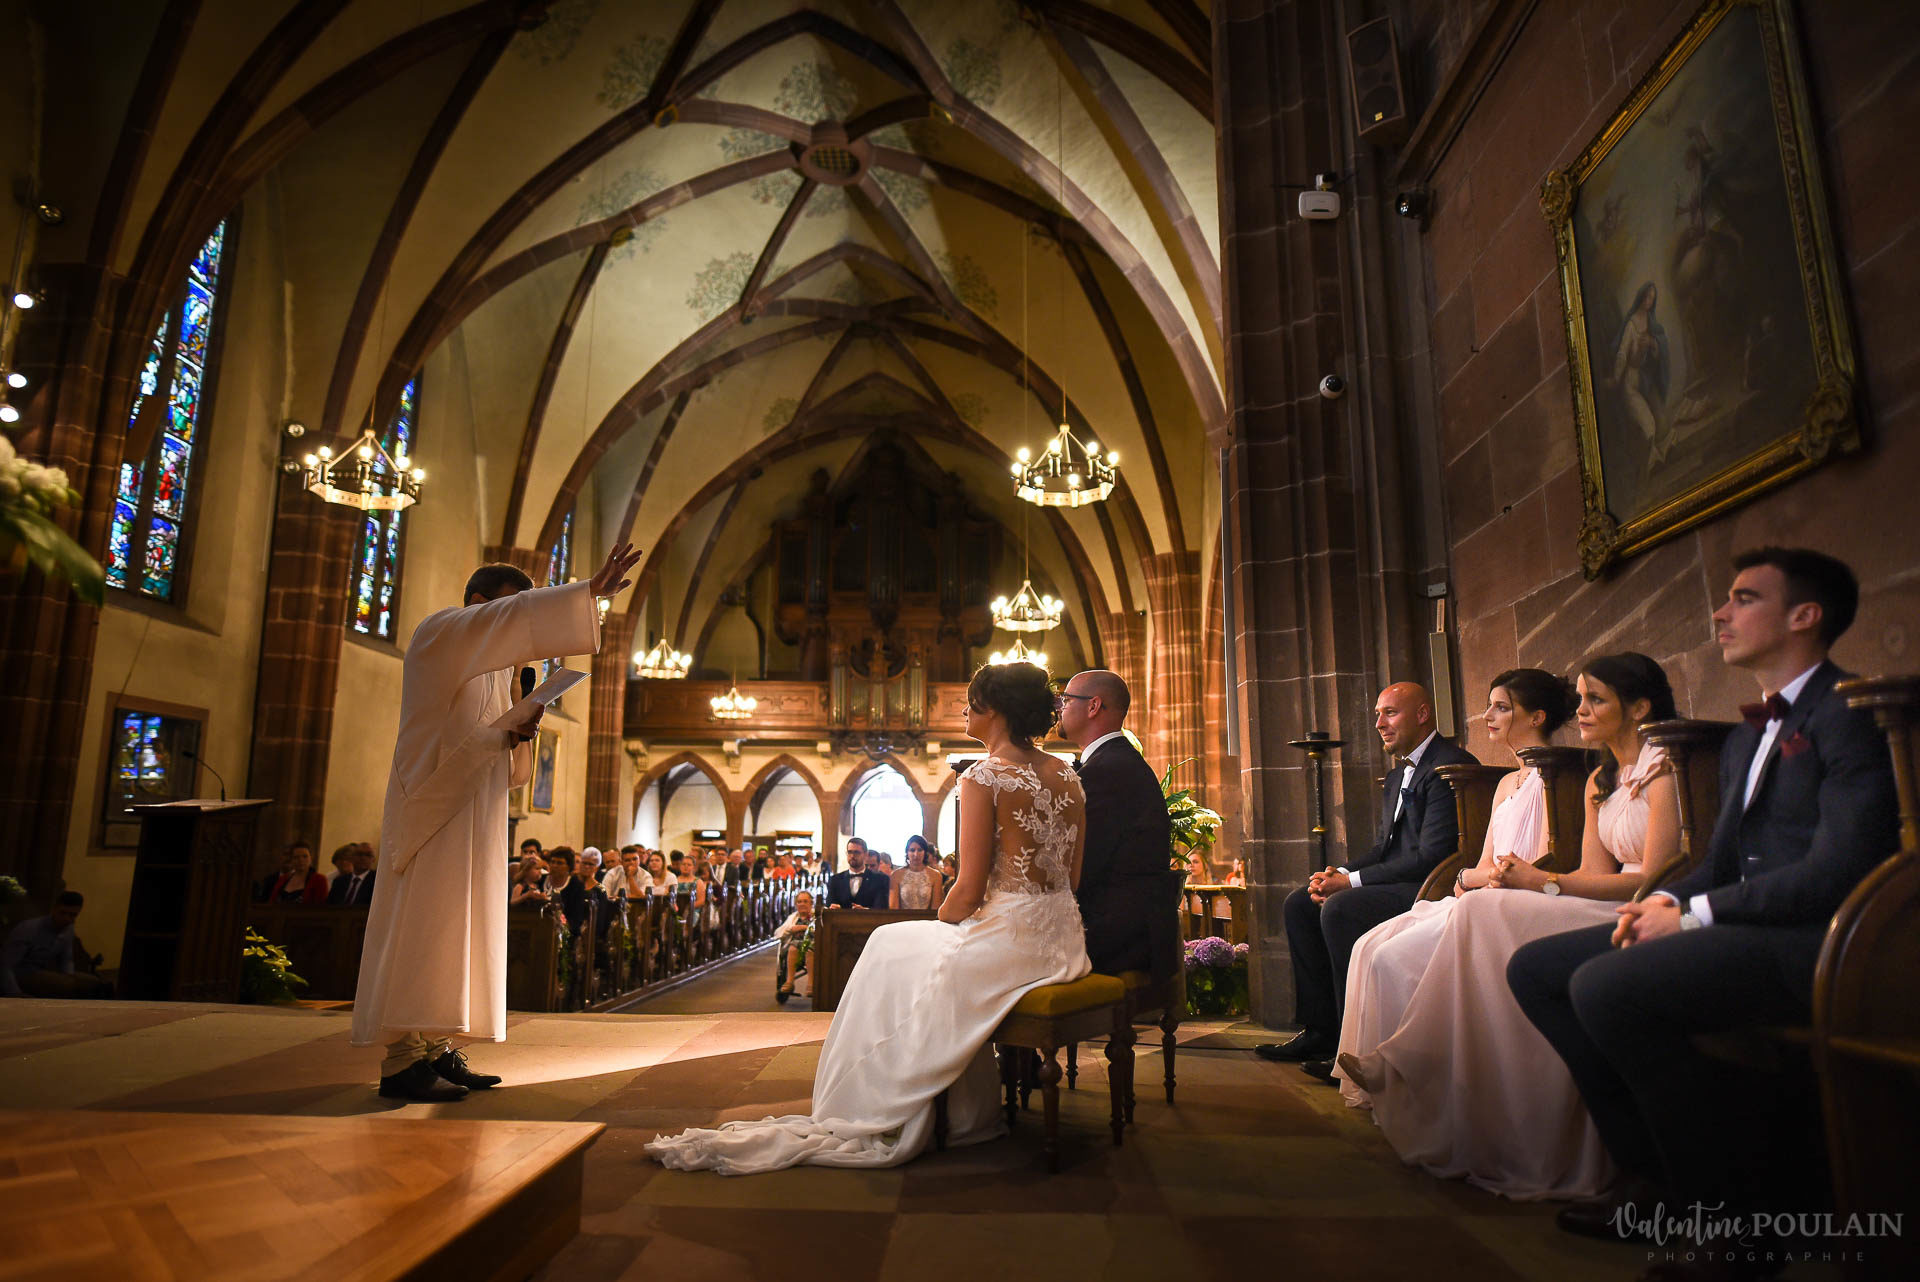 Mariage convivial Saverne - Valentine Poulain dos